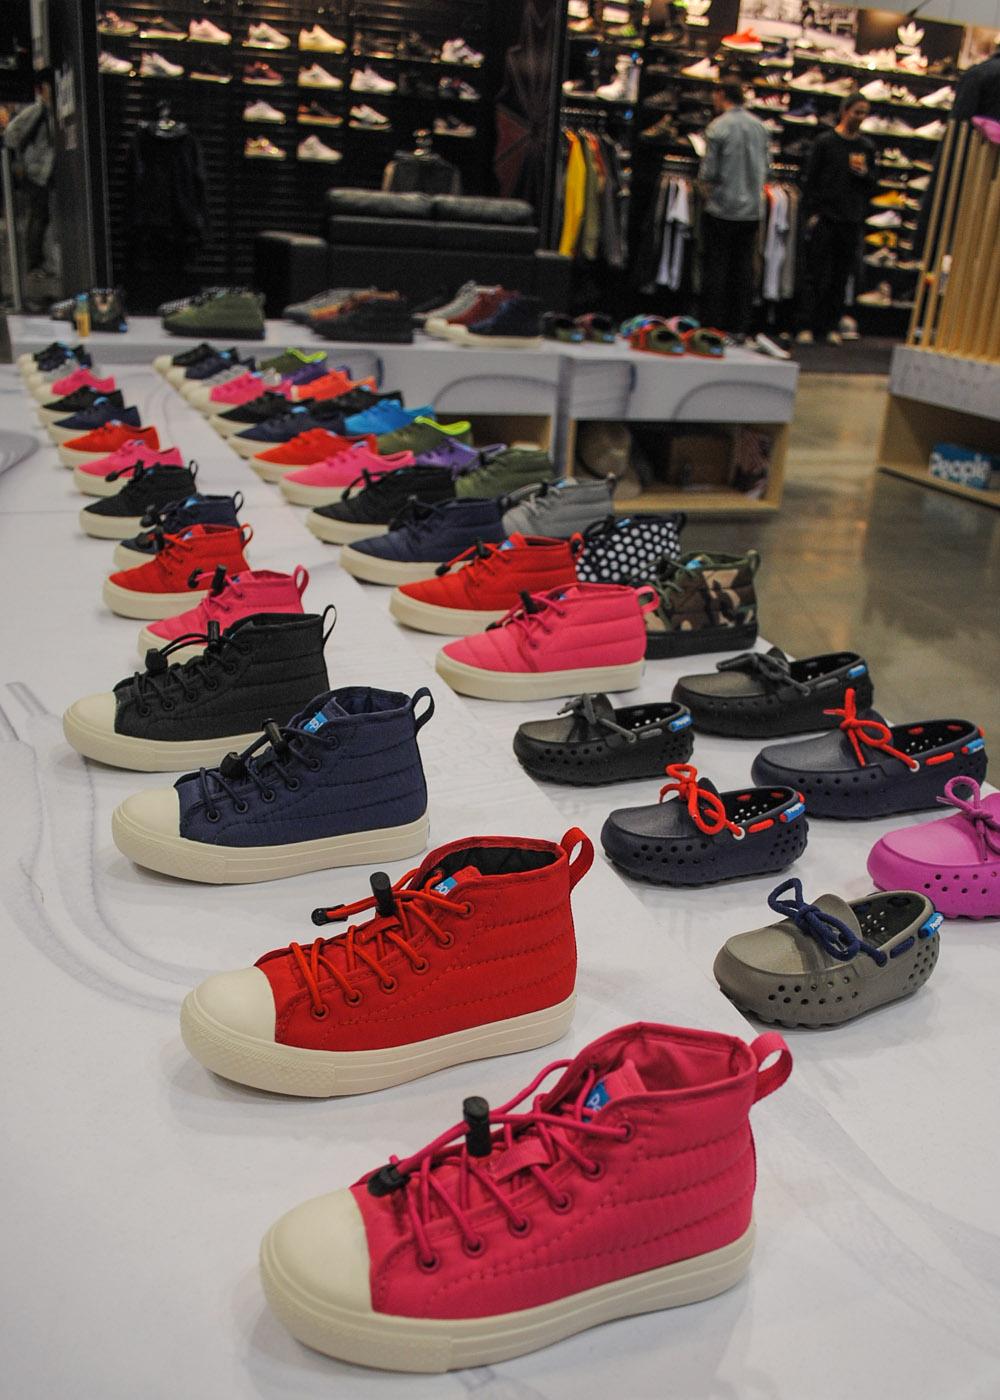 People Footwear Kids - Image: Vanessa Tam / Vancity Buzz